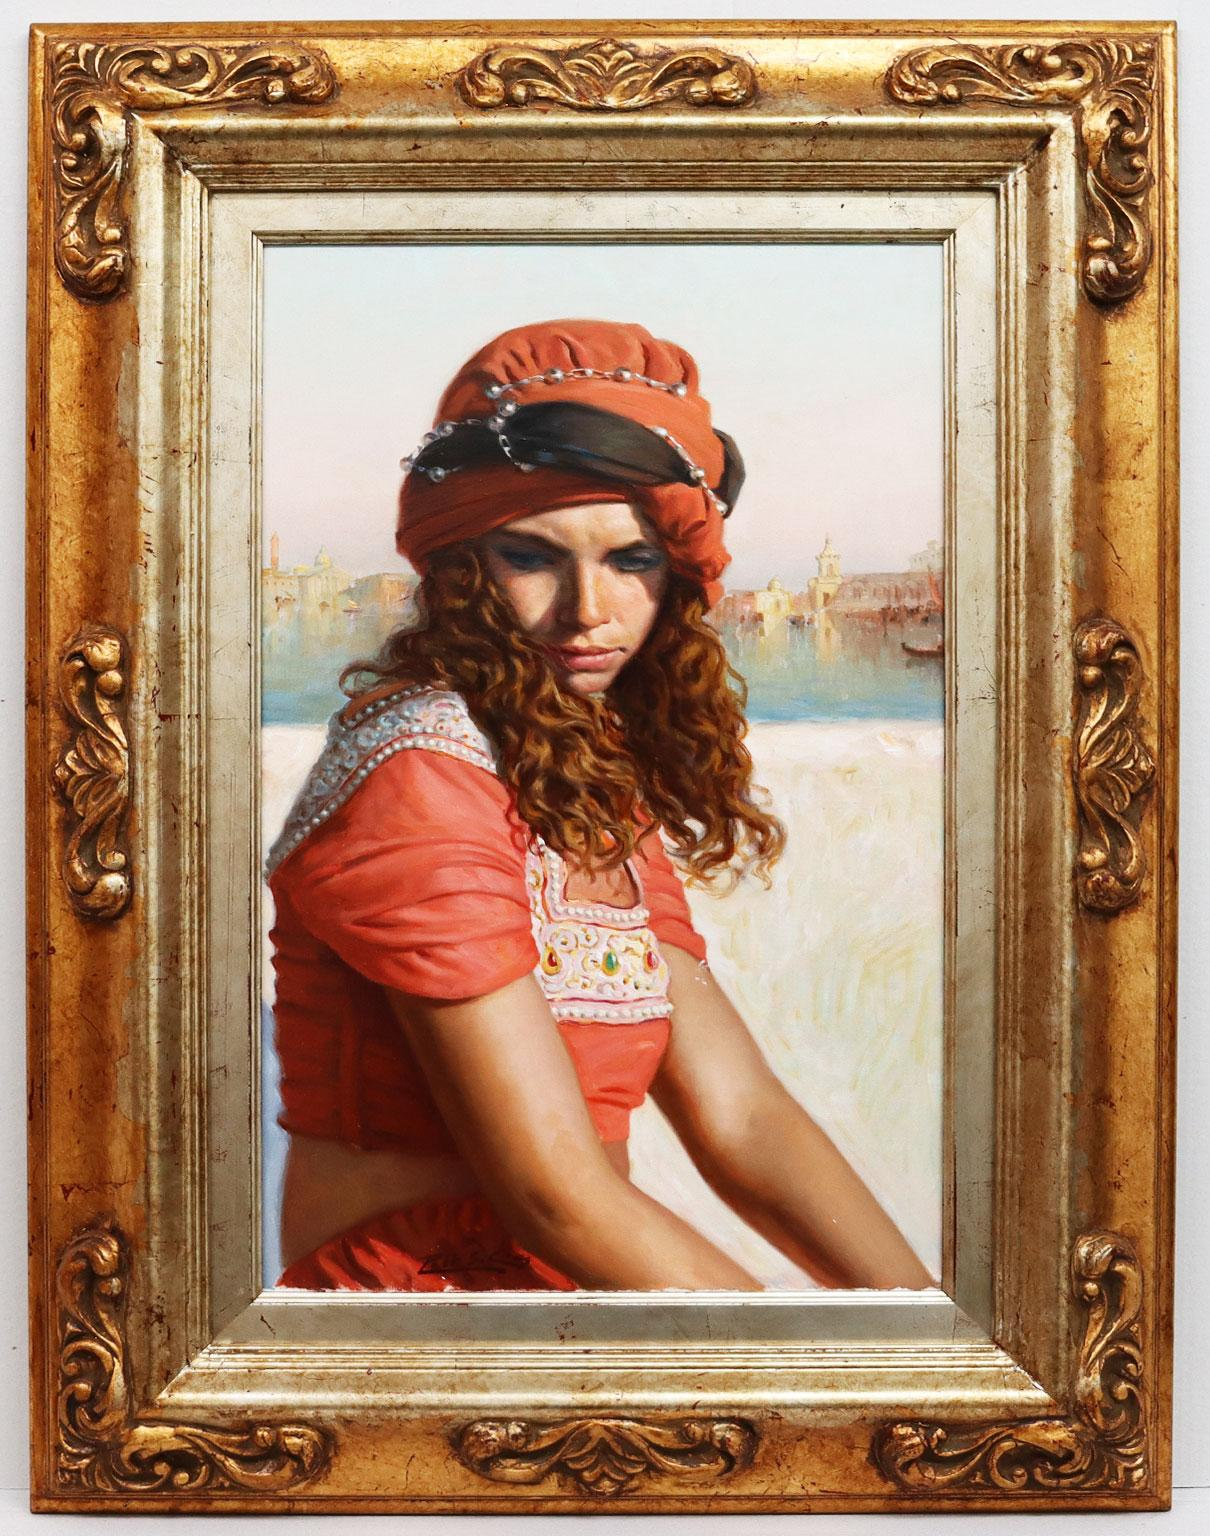 Venetian Girl - Chías Oil painting on canvas Realism